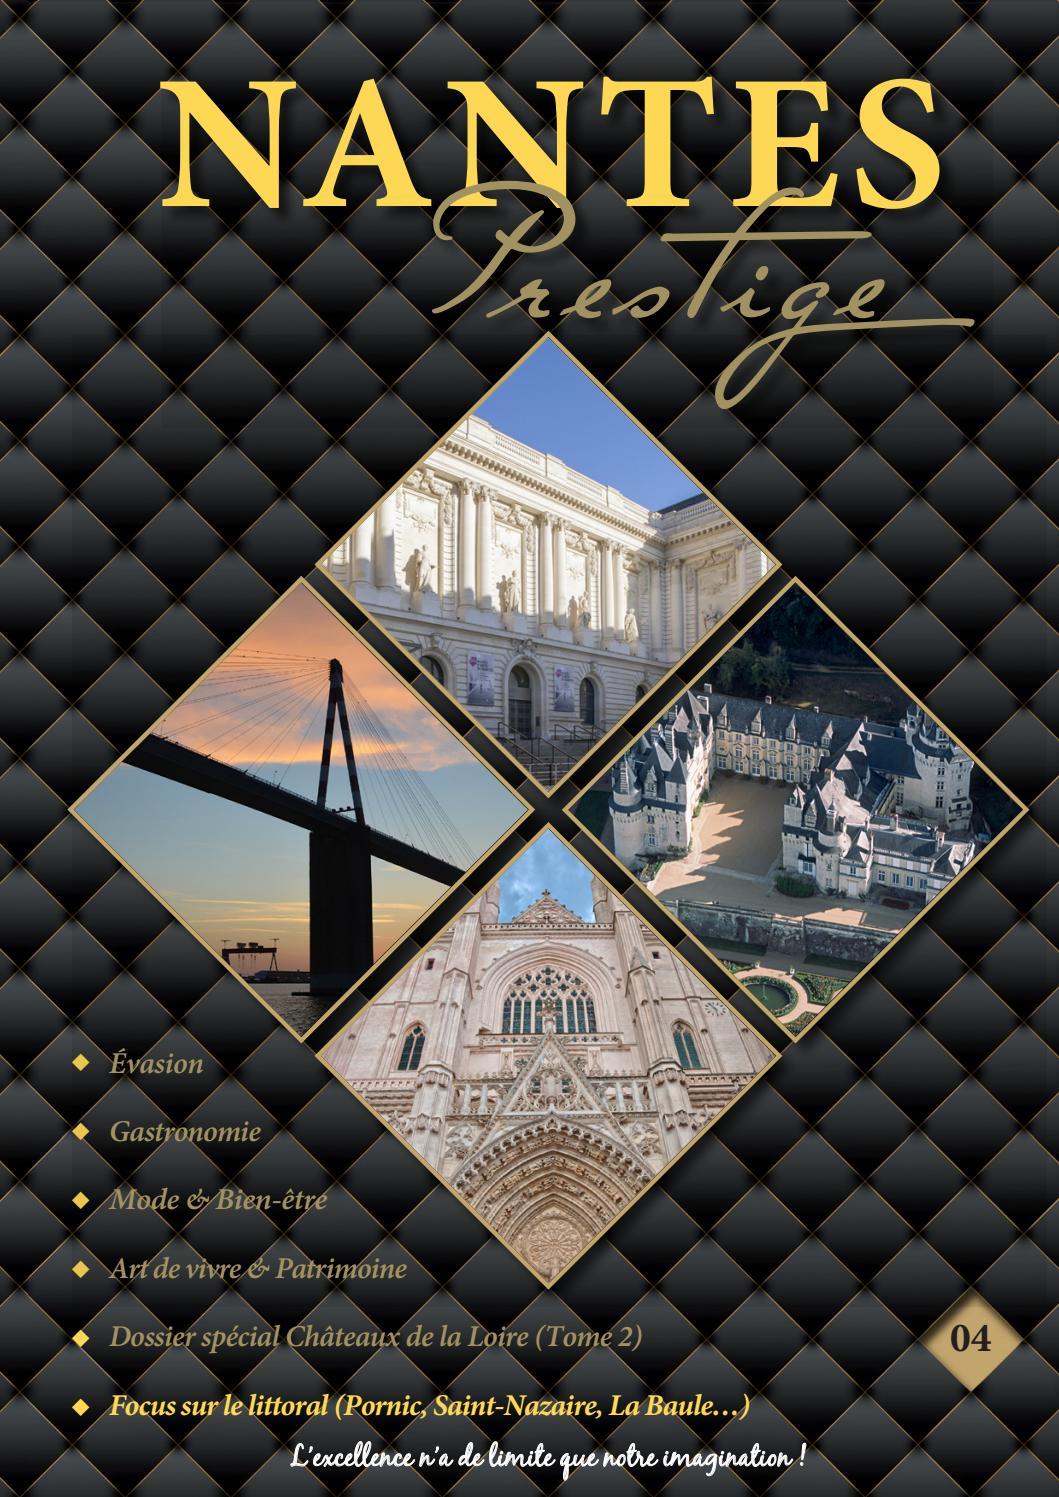 Nantes Prestige 04 by Nantes Prestige - issuu 5d4bd1bde92